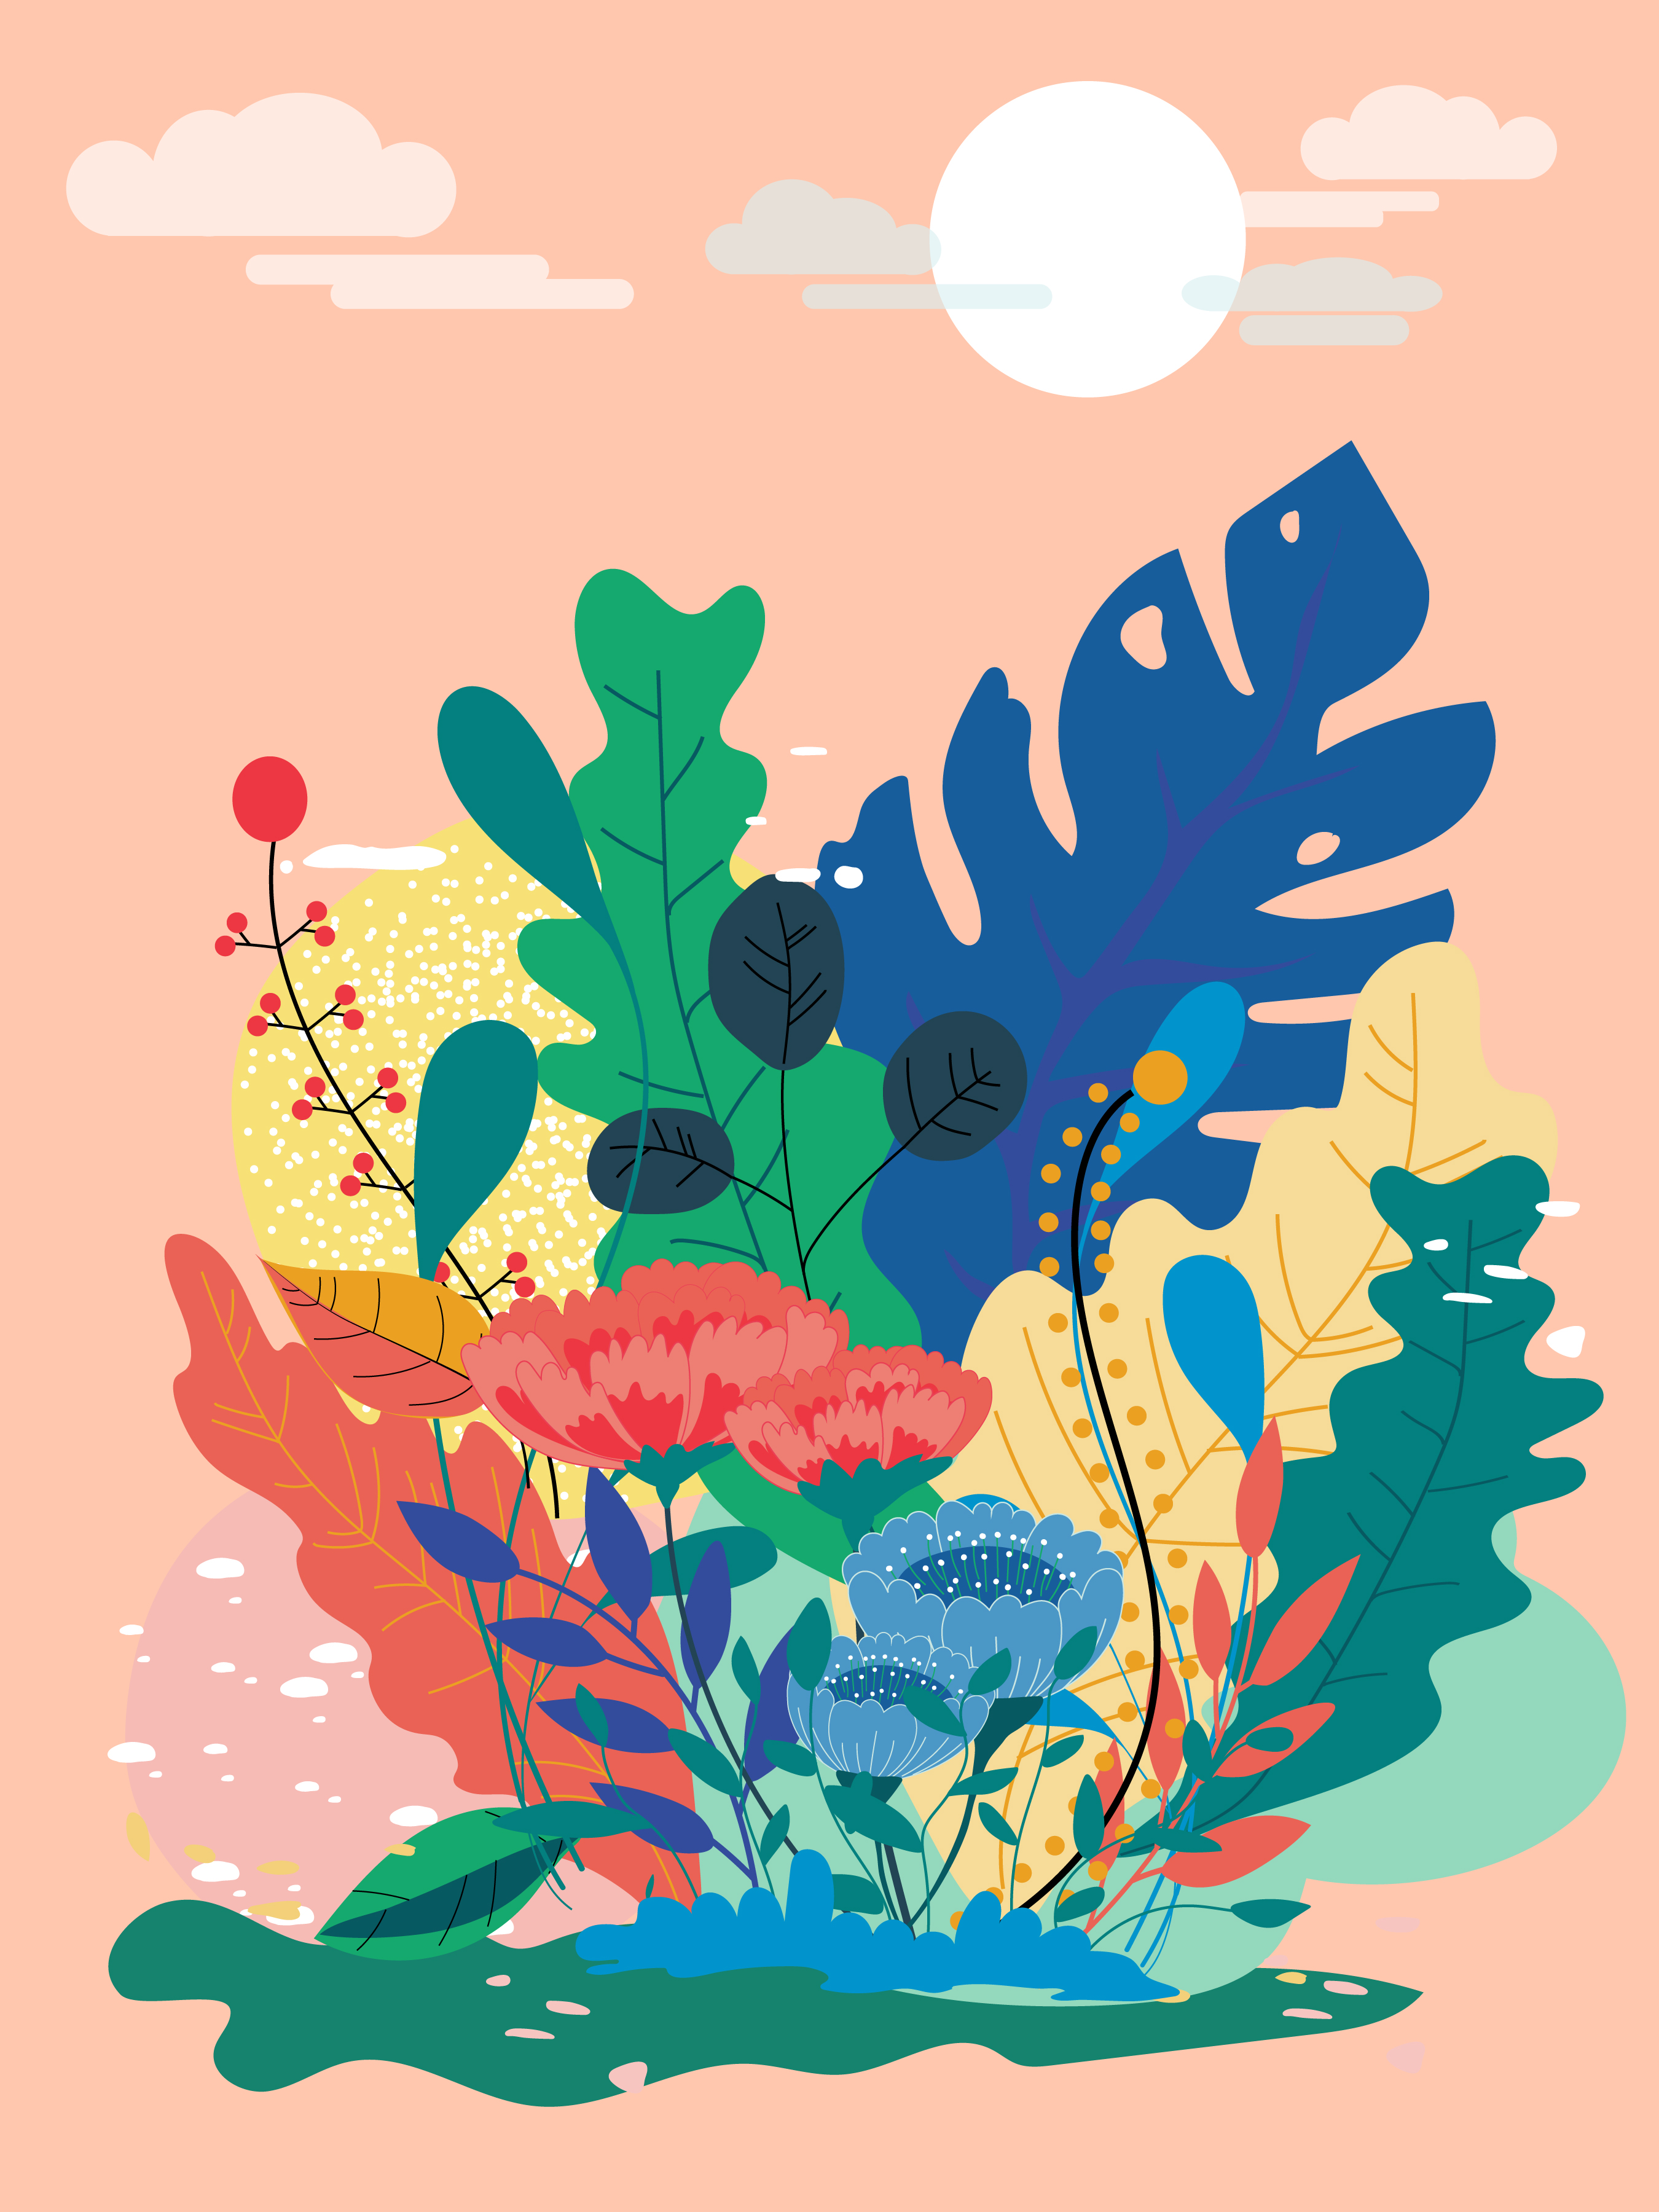 example recolor artwork